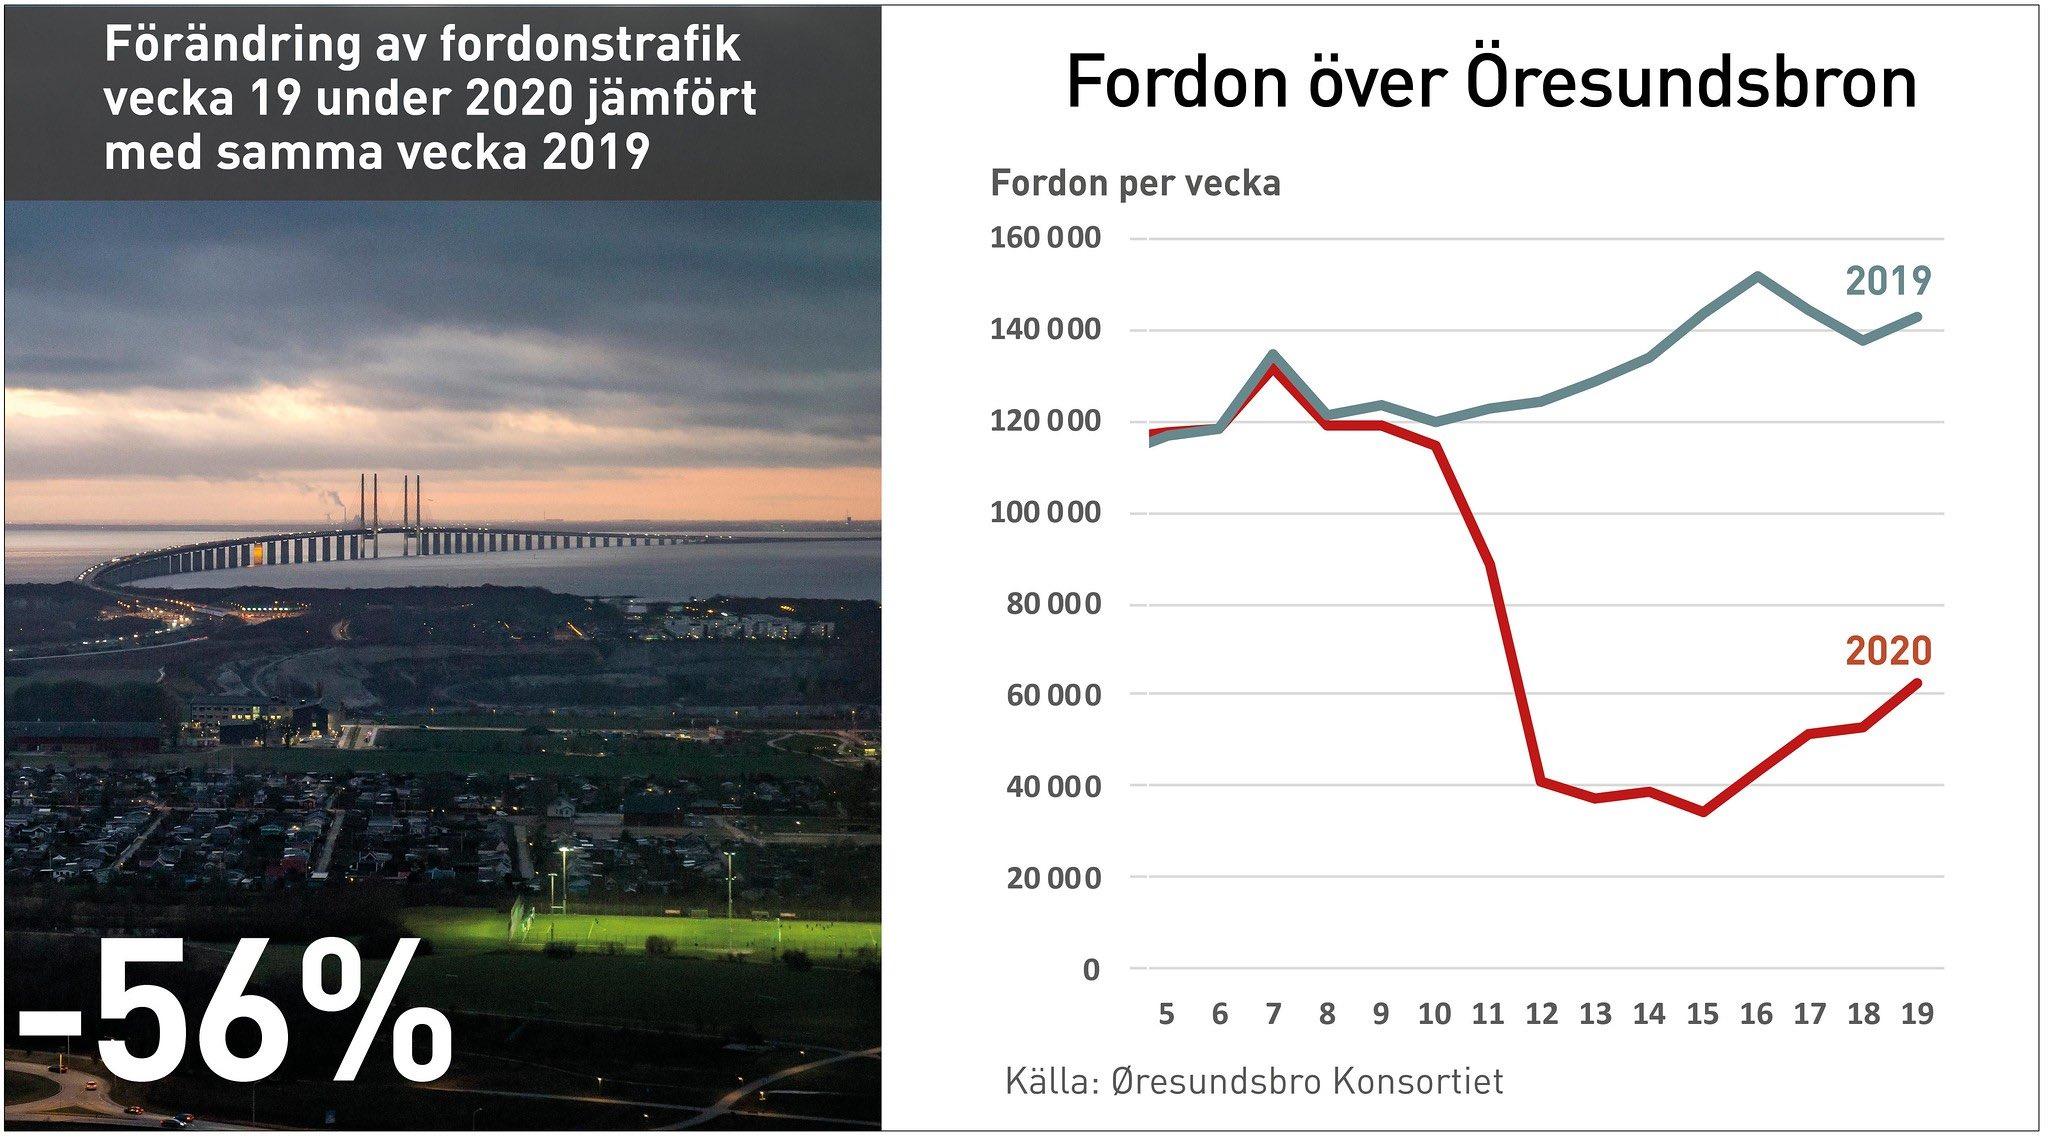 20200514 fordonstrafik over Oresundsbron v19 SE web